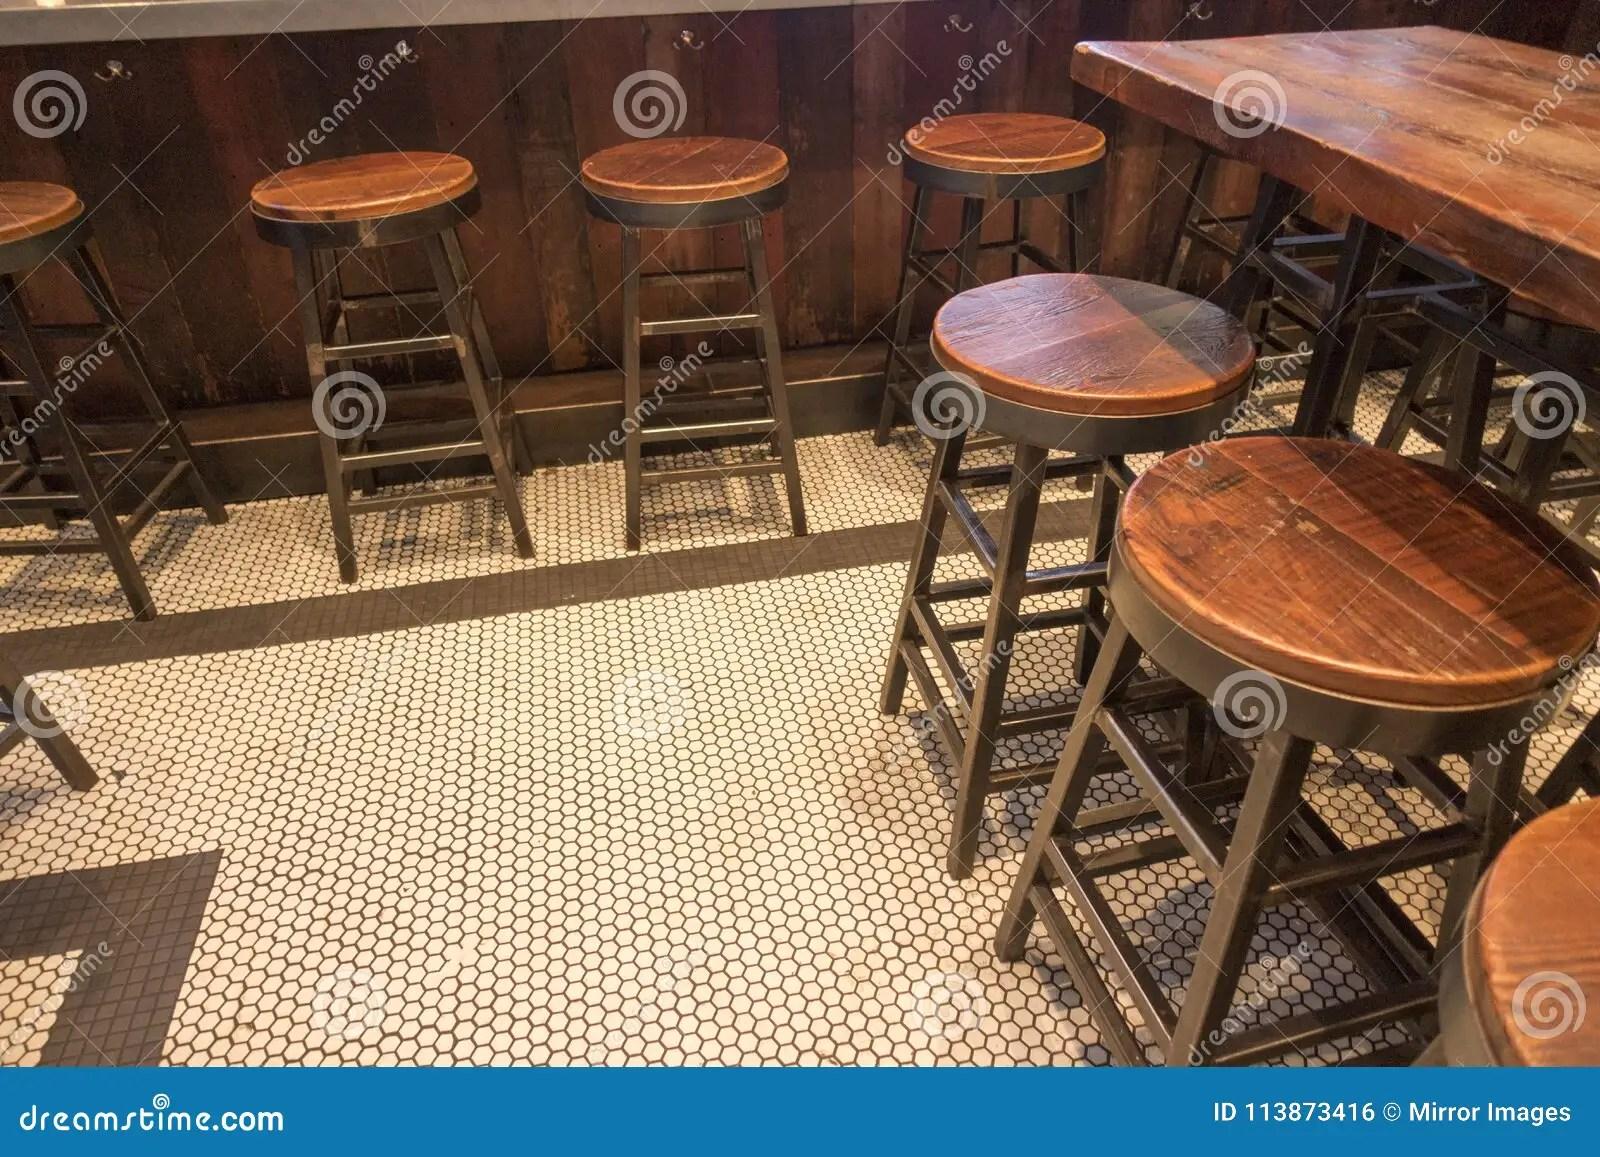 kitchen stools with backs cabinet granite top 酒吧和木头金属凳子库存照片 图片包括有没人 都市 不列塔尼的 客栈 酒吧和木头金属凳子